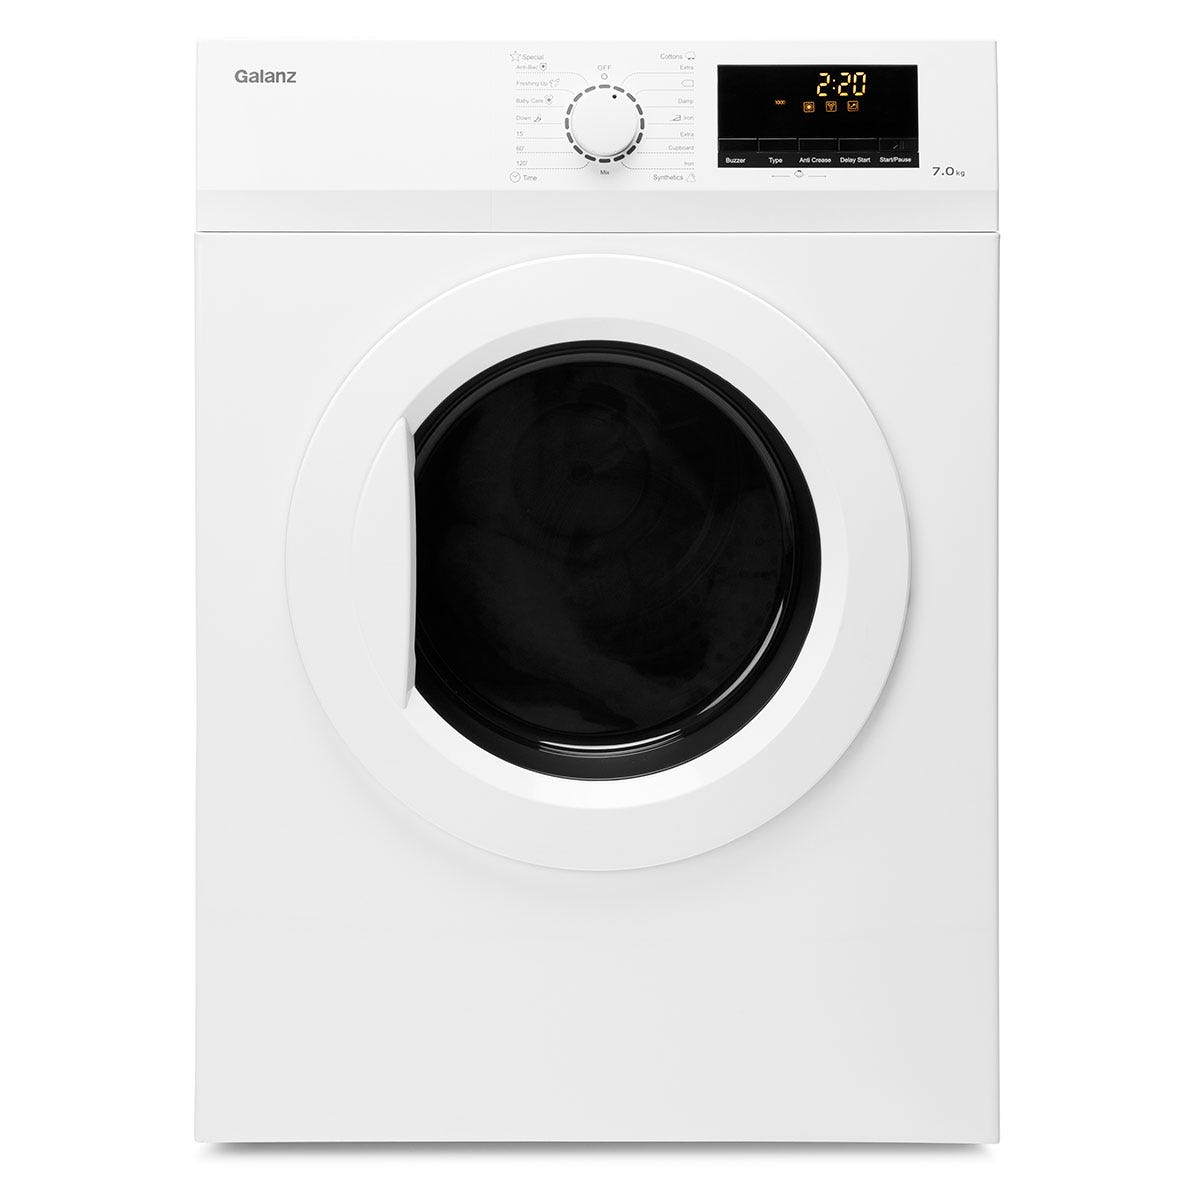 Galanz DUK001W Freestanding Vented 7kg Tumble Dryer - White